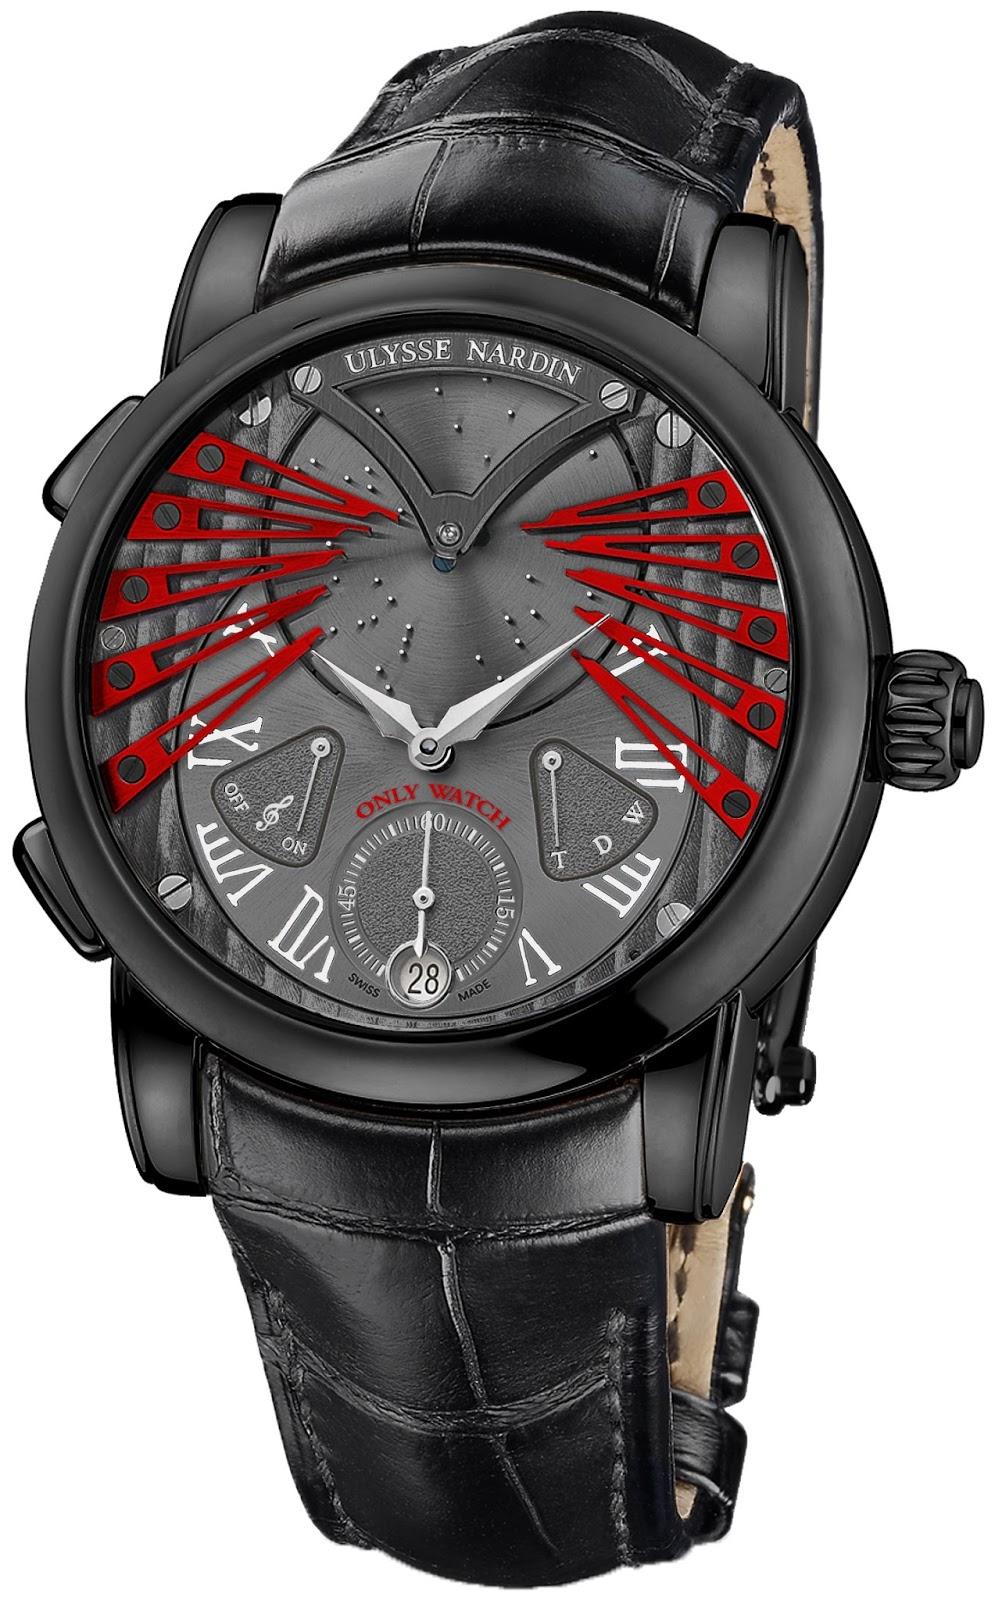 j 39 aime les montres la montre du jour ulysse nardin stranger only watch 2015. Black Bedroom Furniture Sets. Home Design Ideas